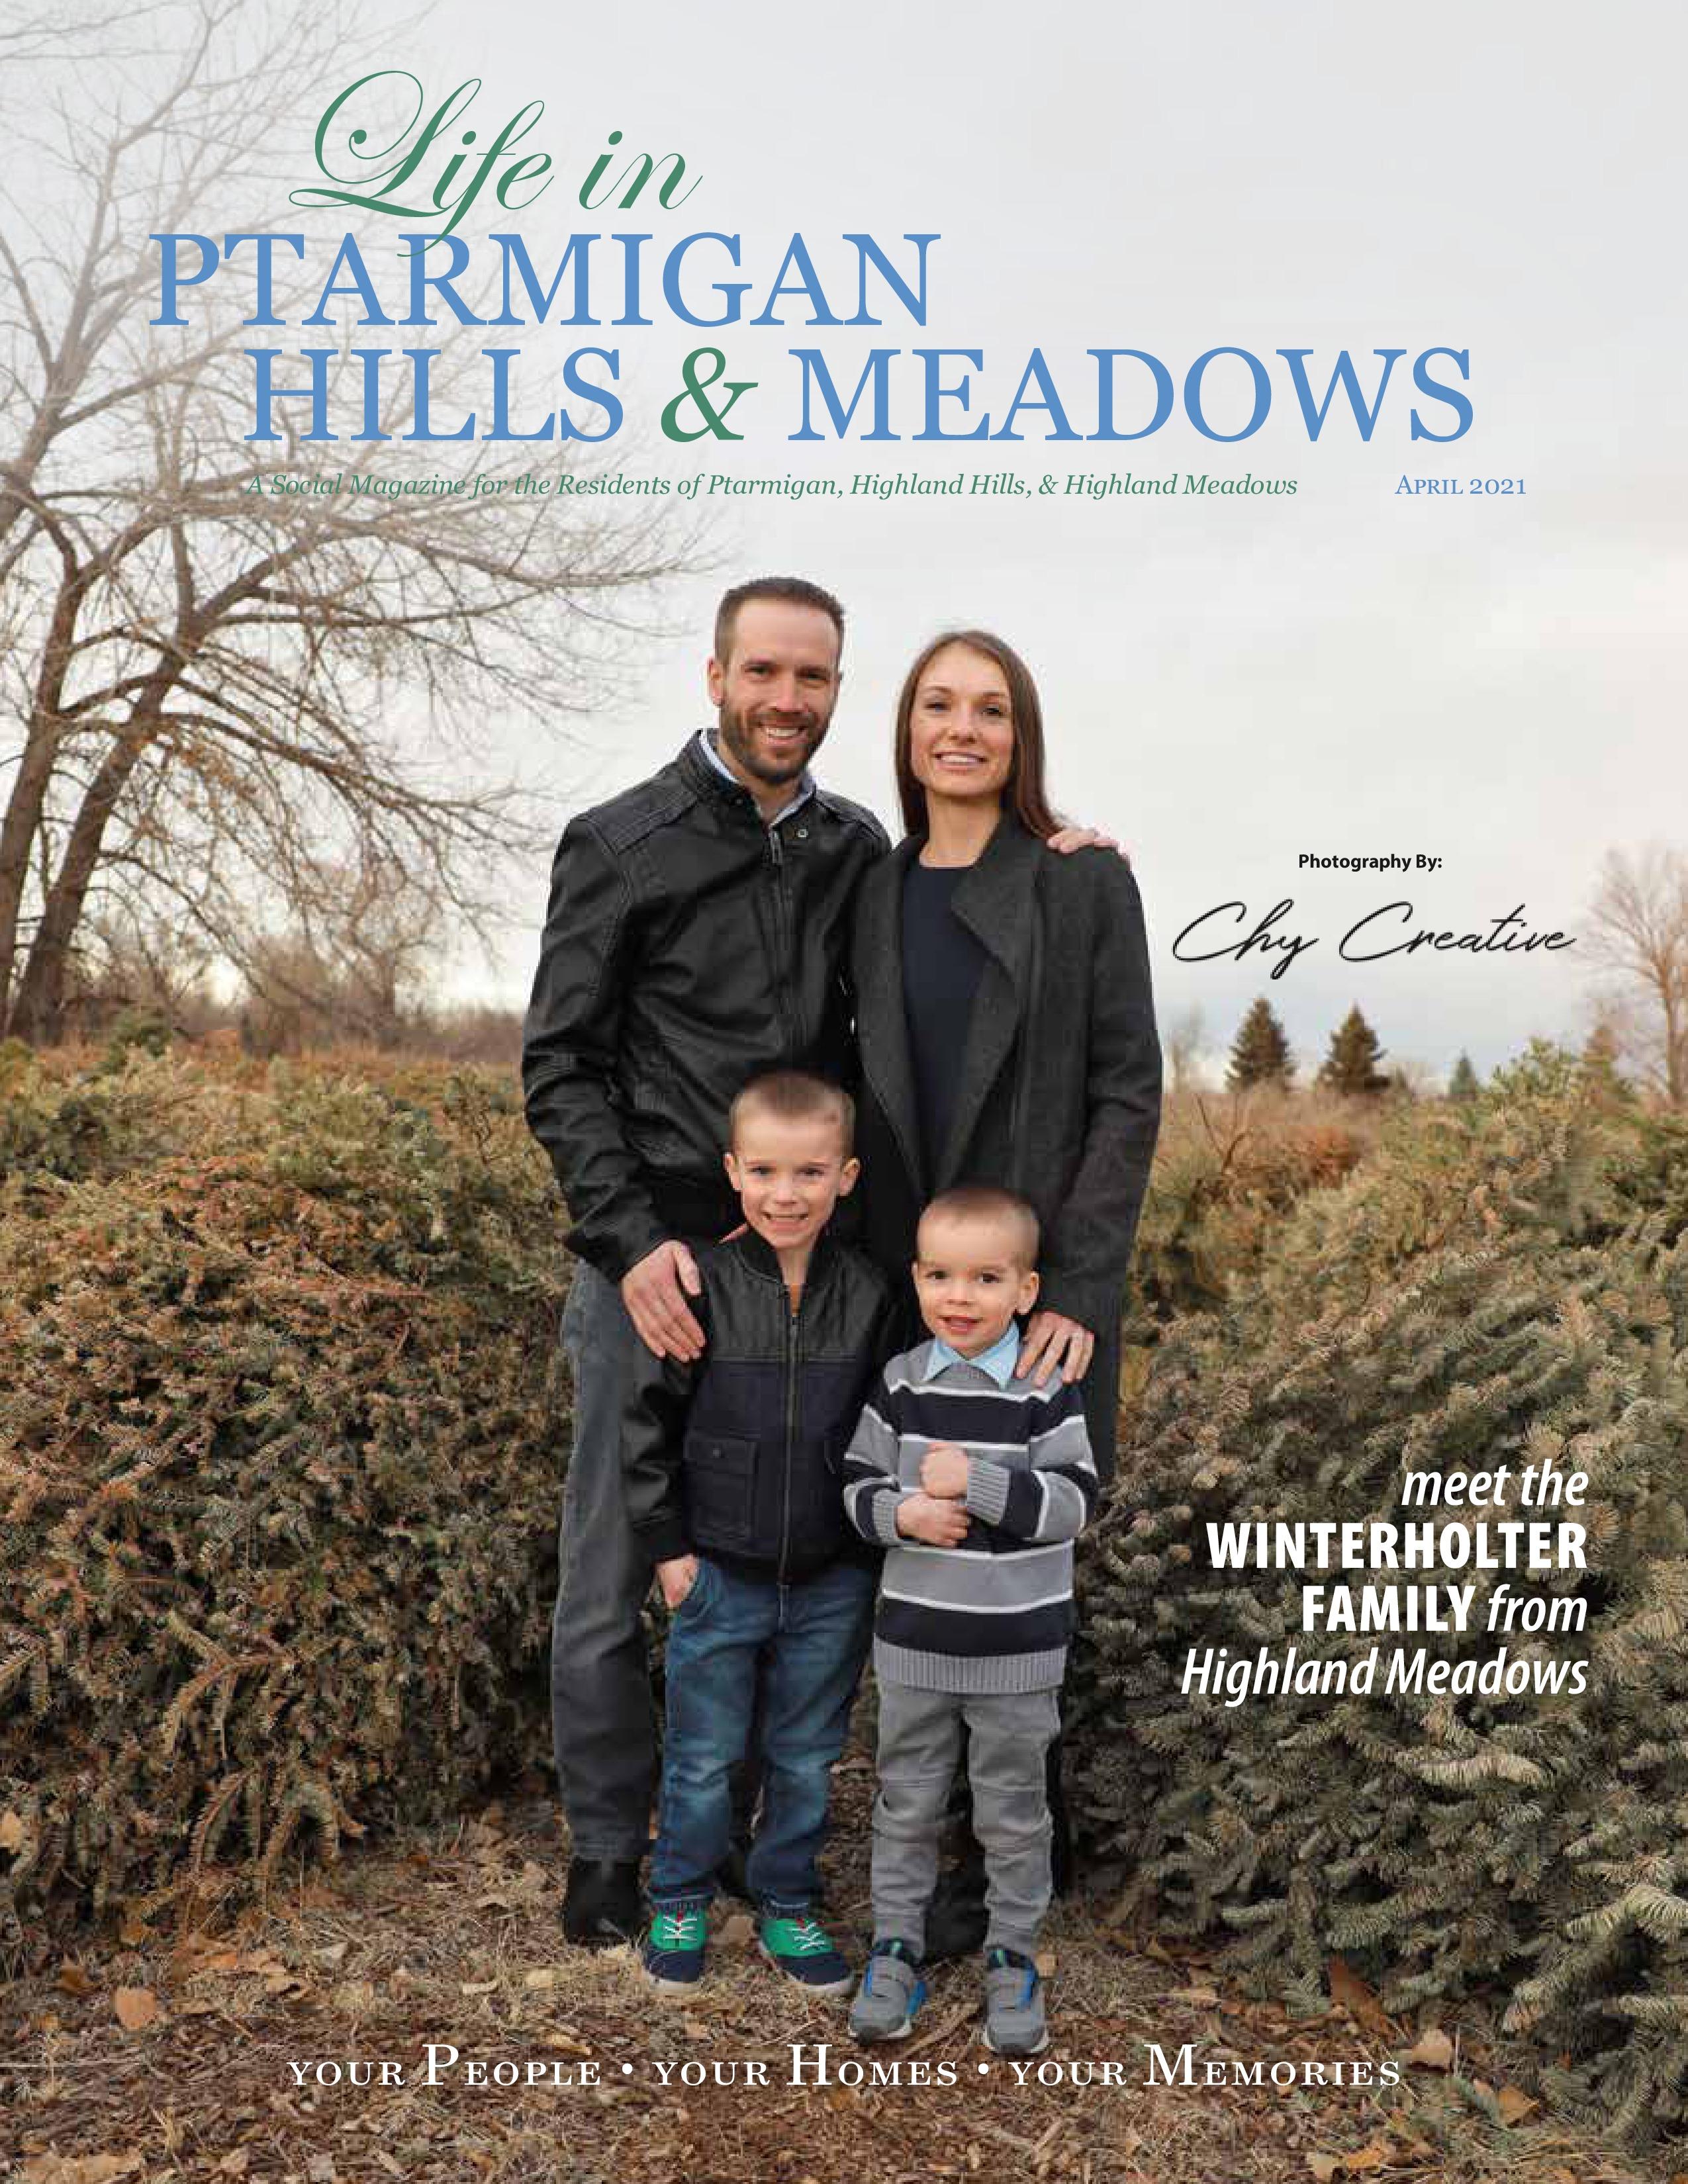 Life in Ptarmigan Hills and Meadows 2021-04-01